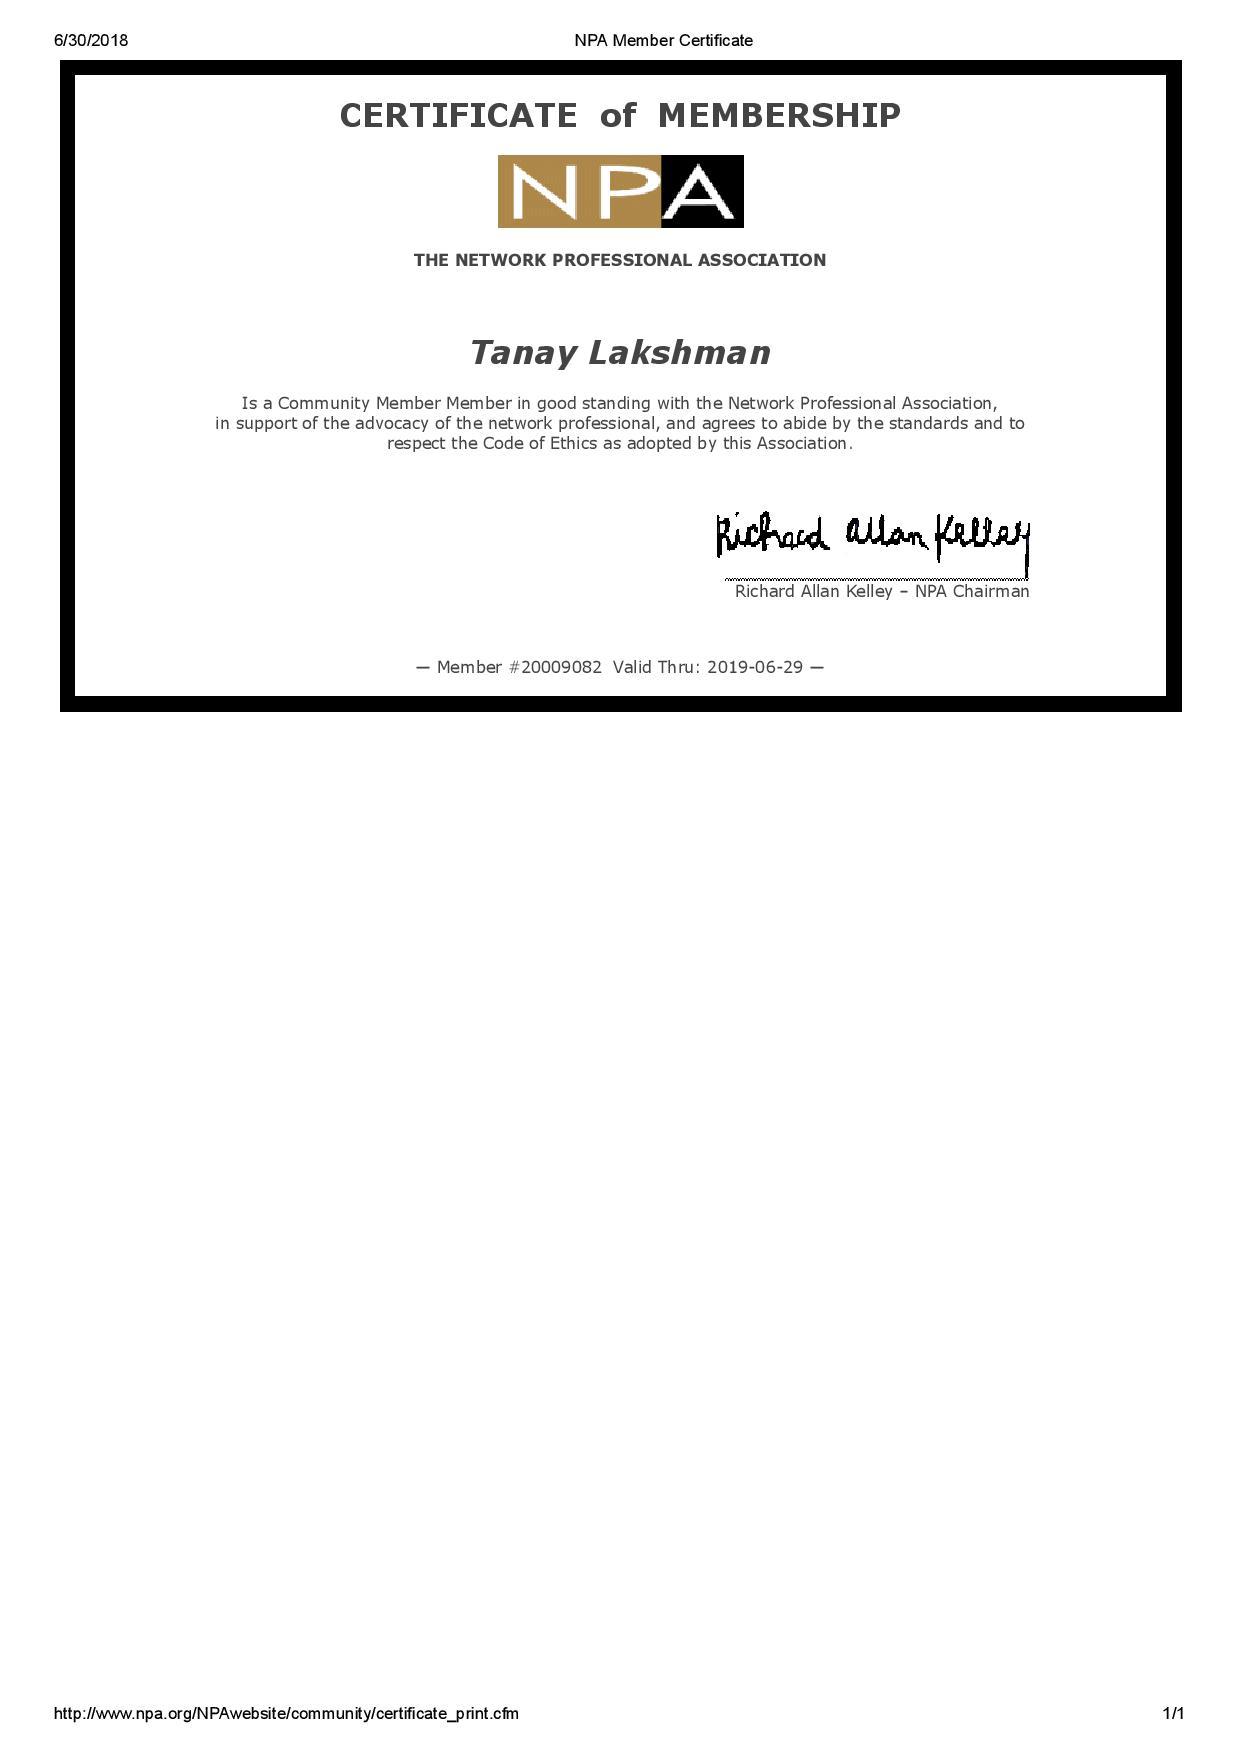 Tanay Lakshman